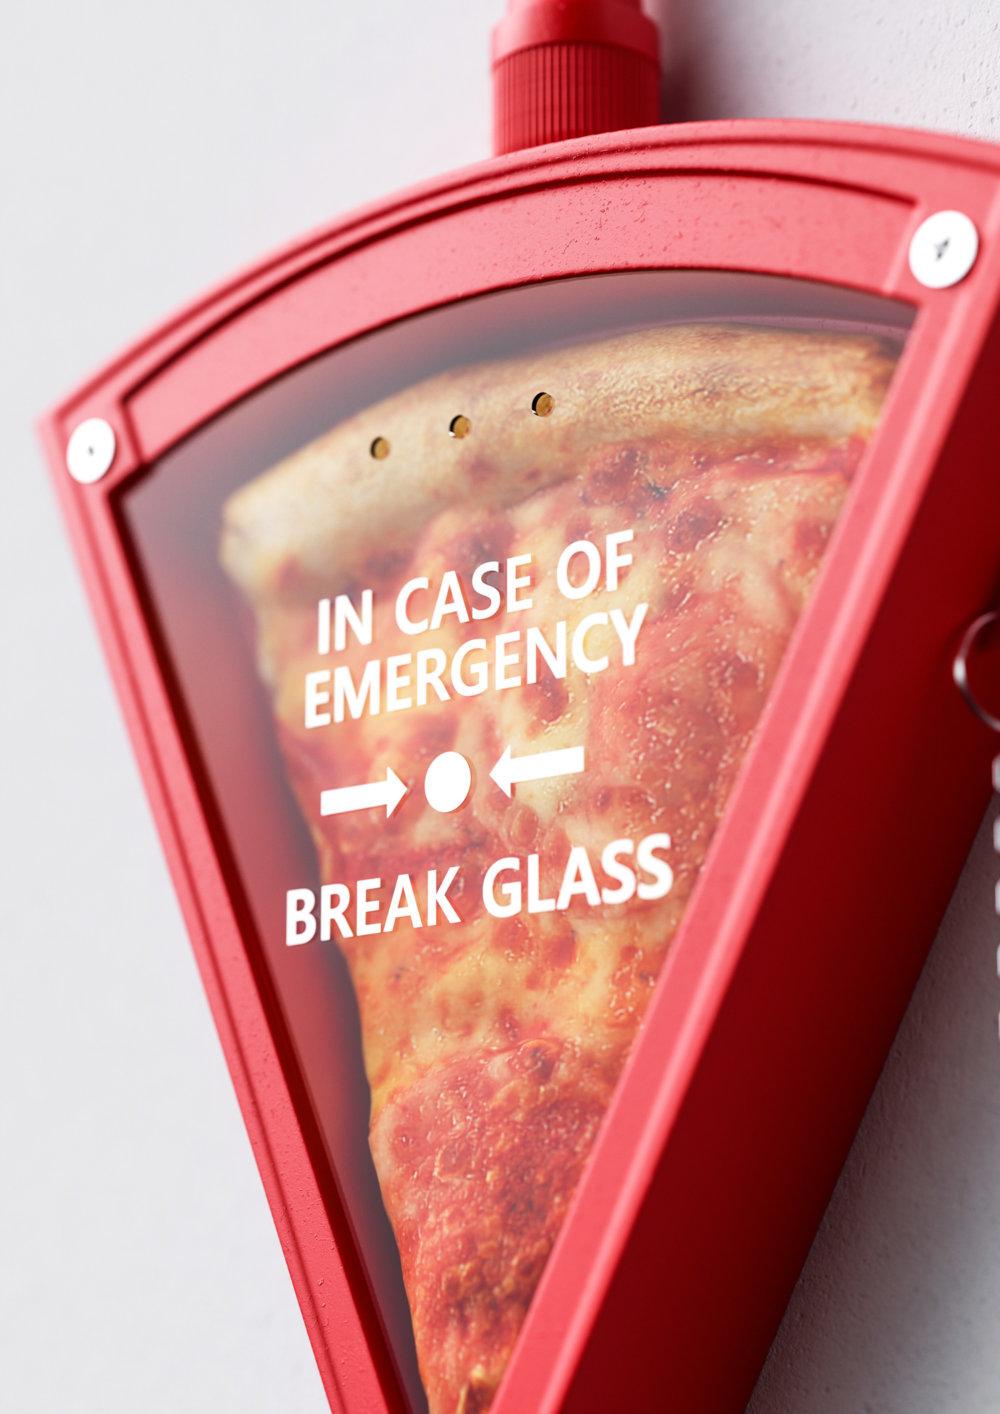 In Case Of Emergency 3d Digital Illustration Series By Ben Fearnley 2